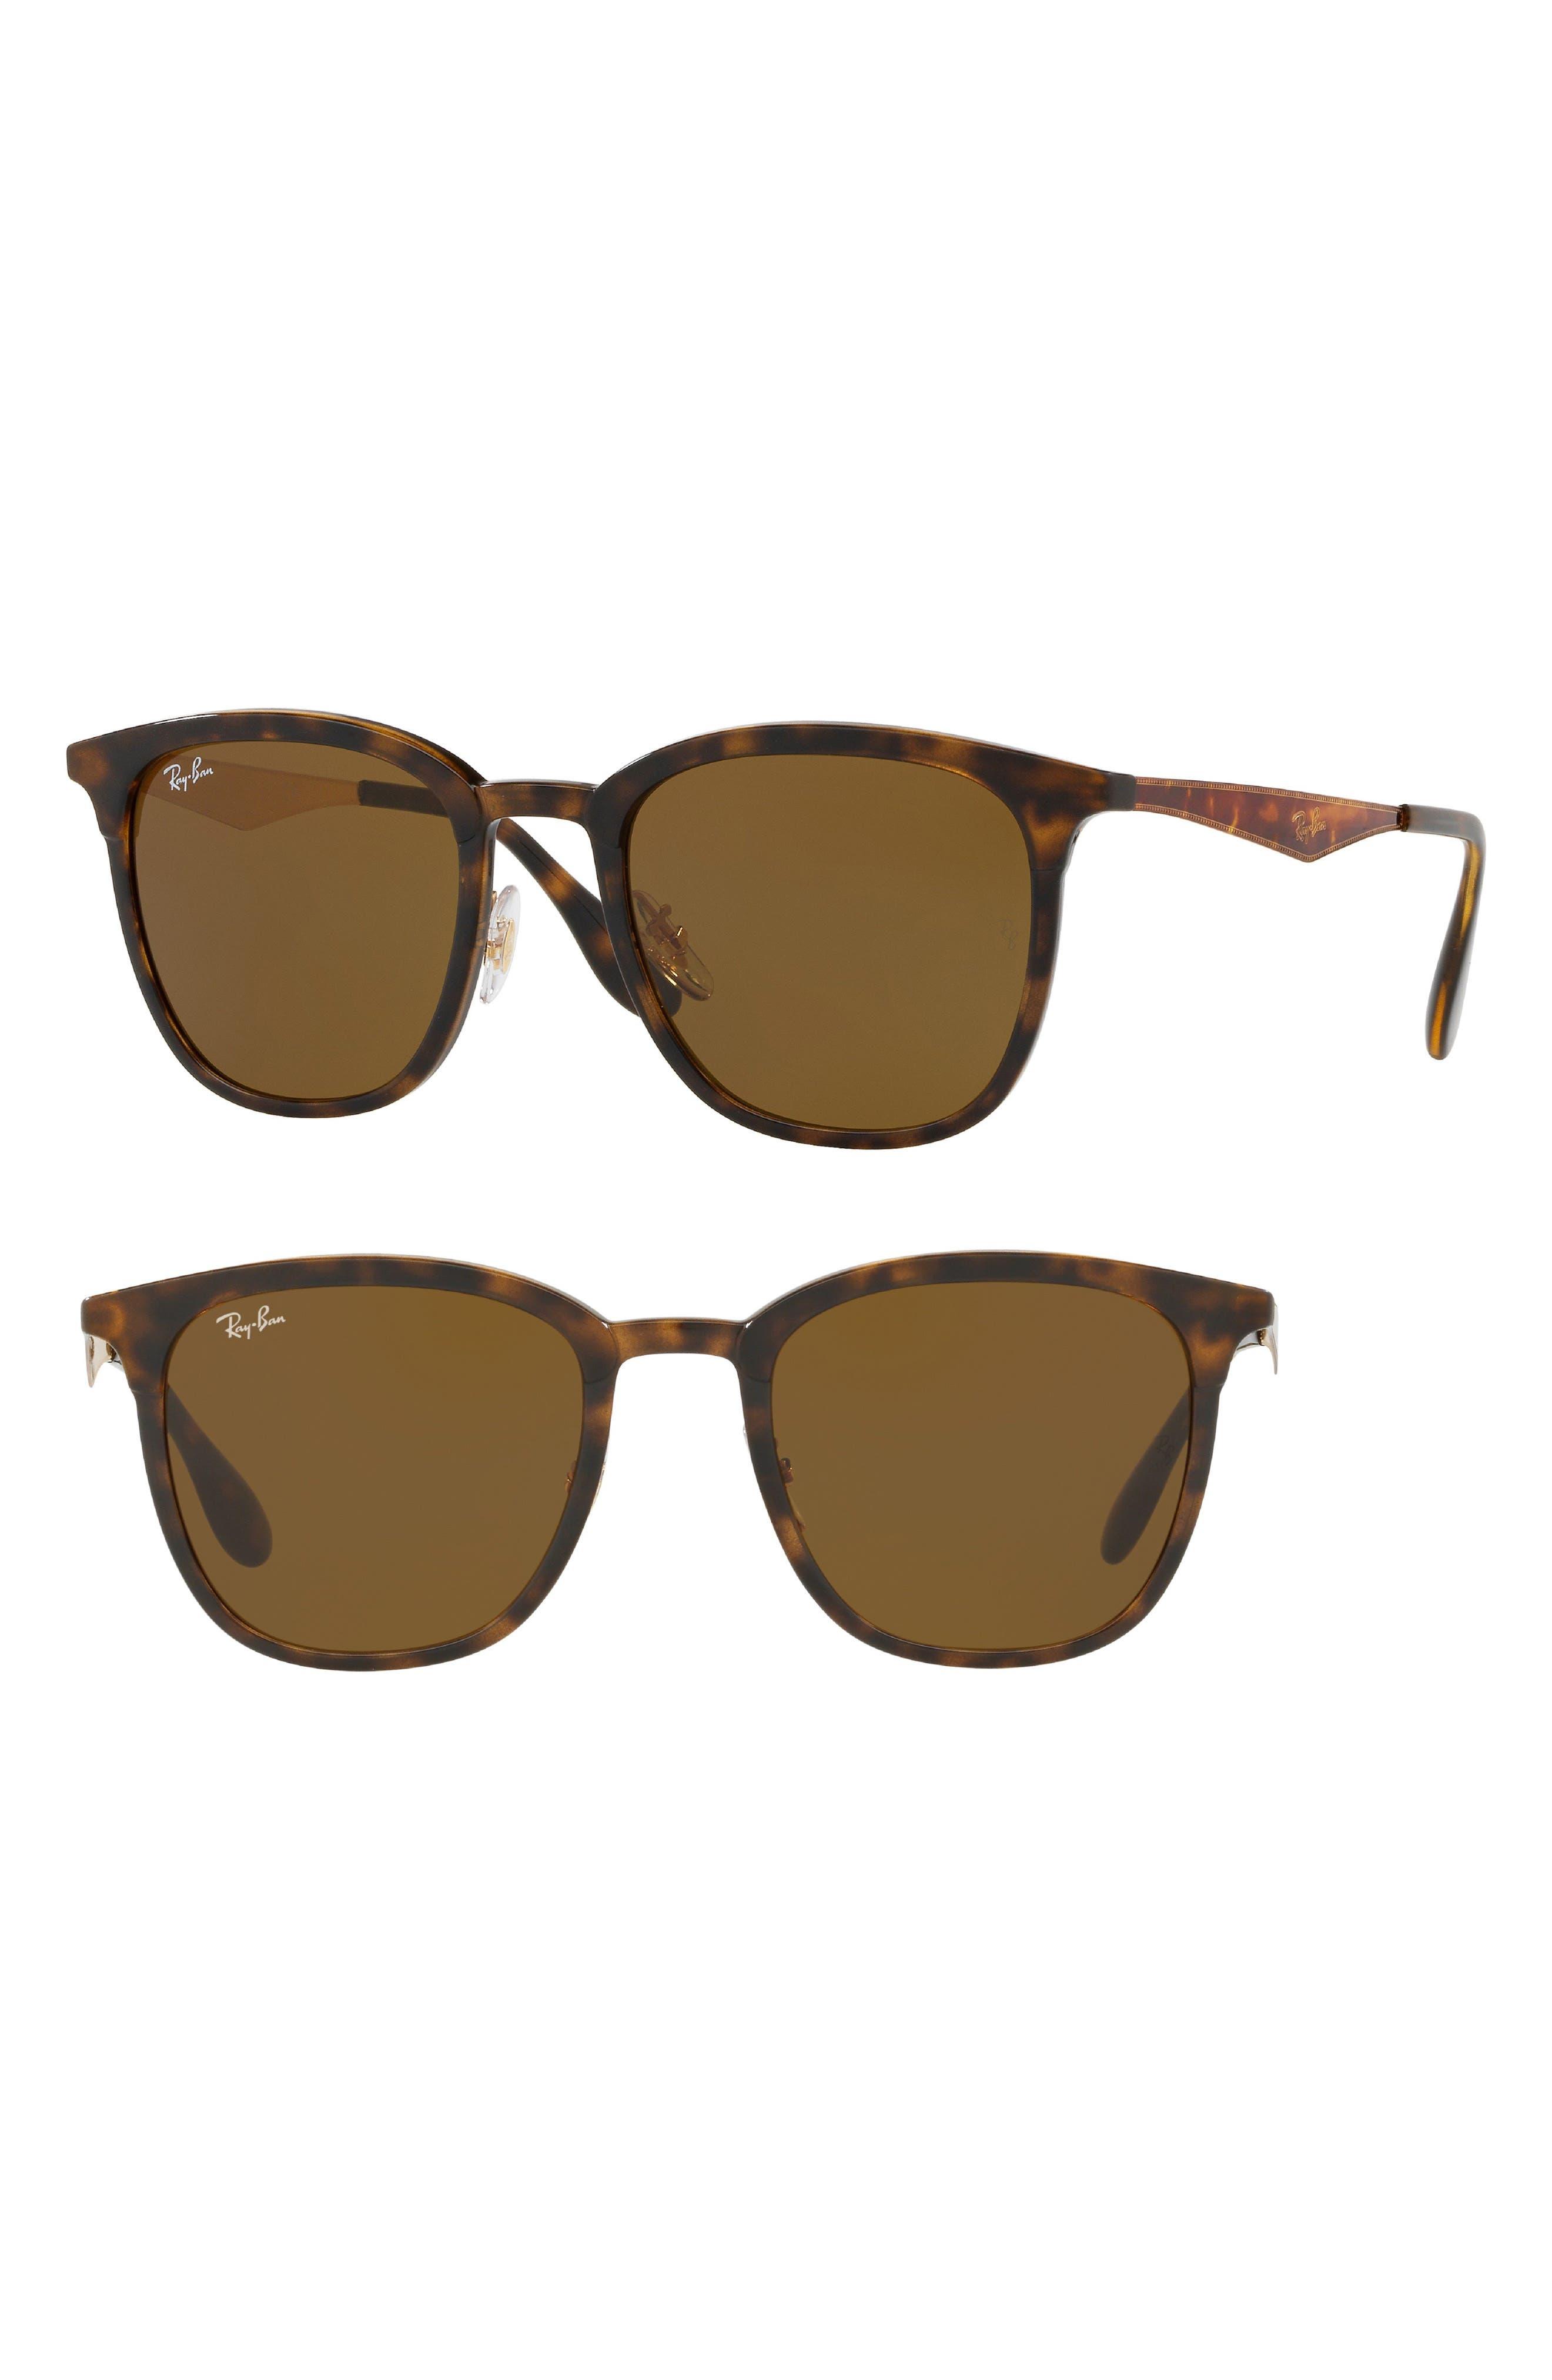 Highstreet 51mm Square Sunglasses,                         Main,                         color, 200